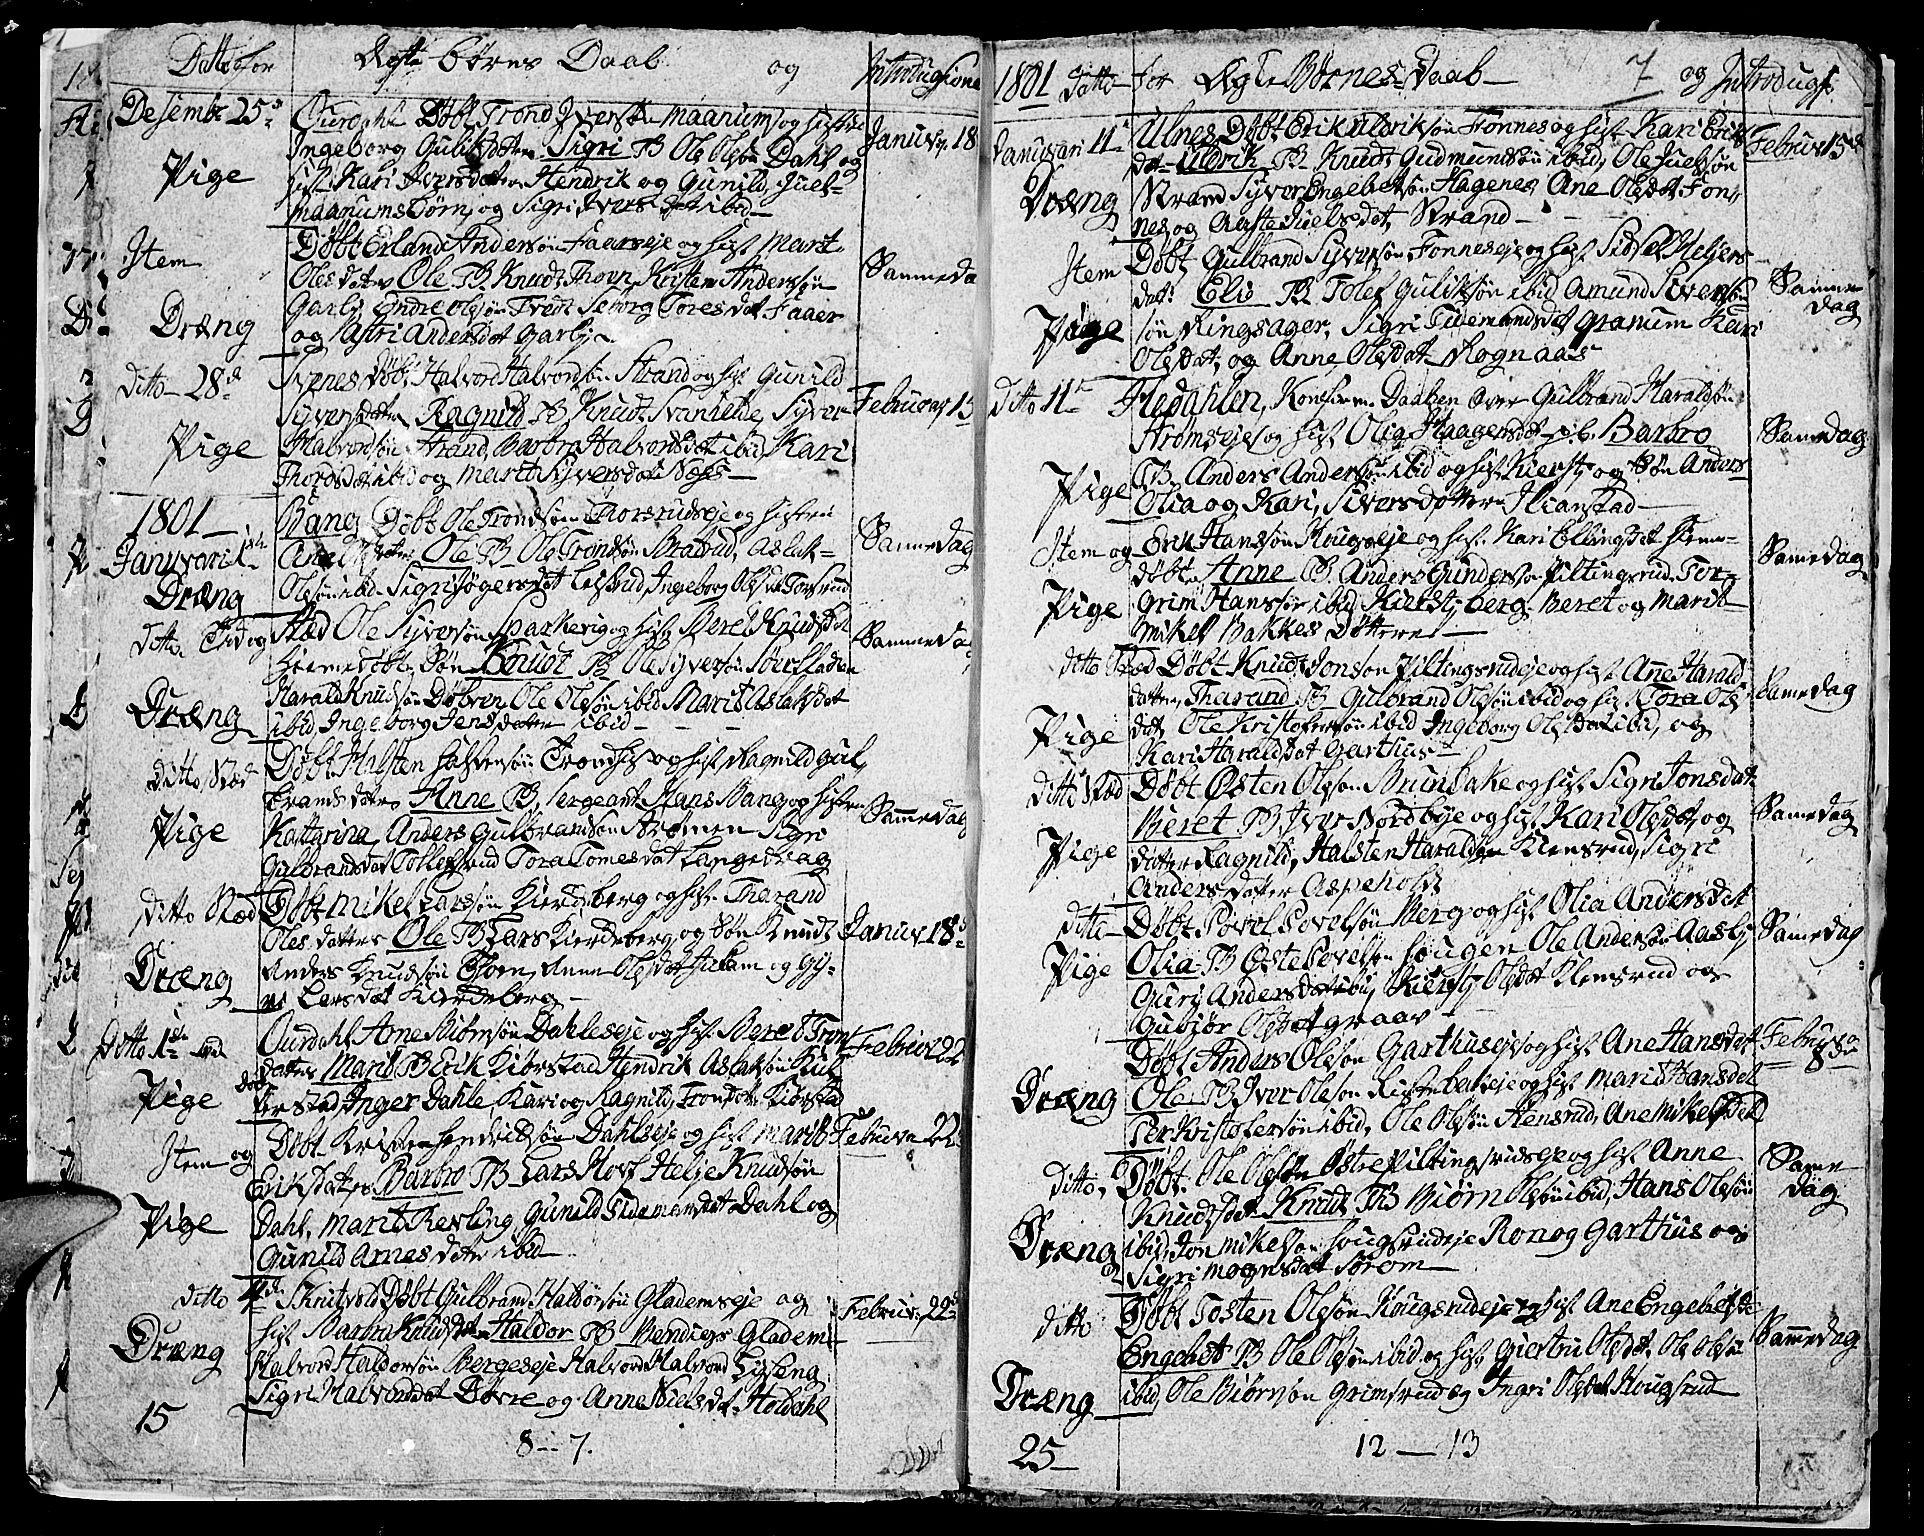 SAH, Aurdal prestekontor, Ministerialbok nr. 7, 1800-1808, s. 7